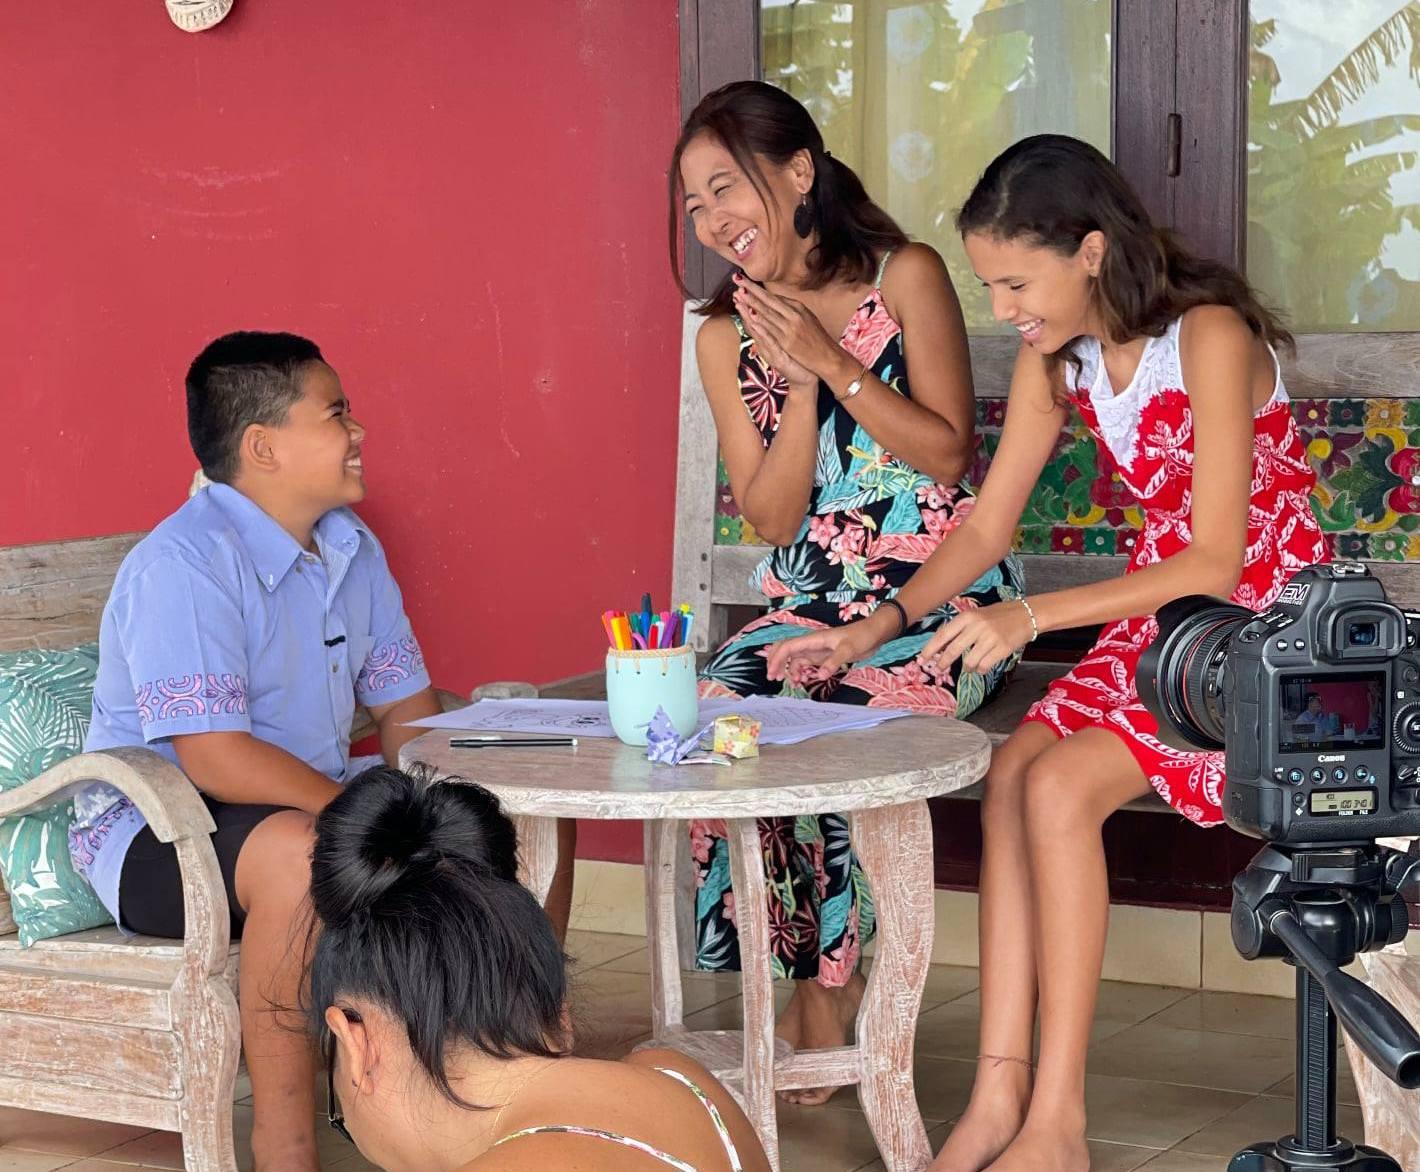 Le reo tahiti du quotidien avec Tama et Vai